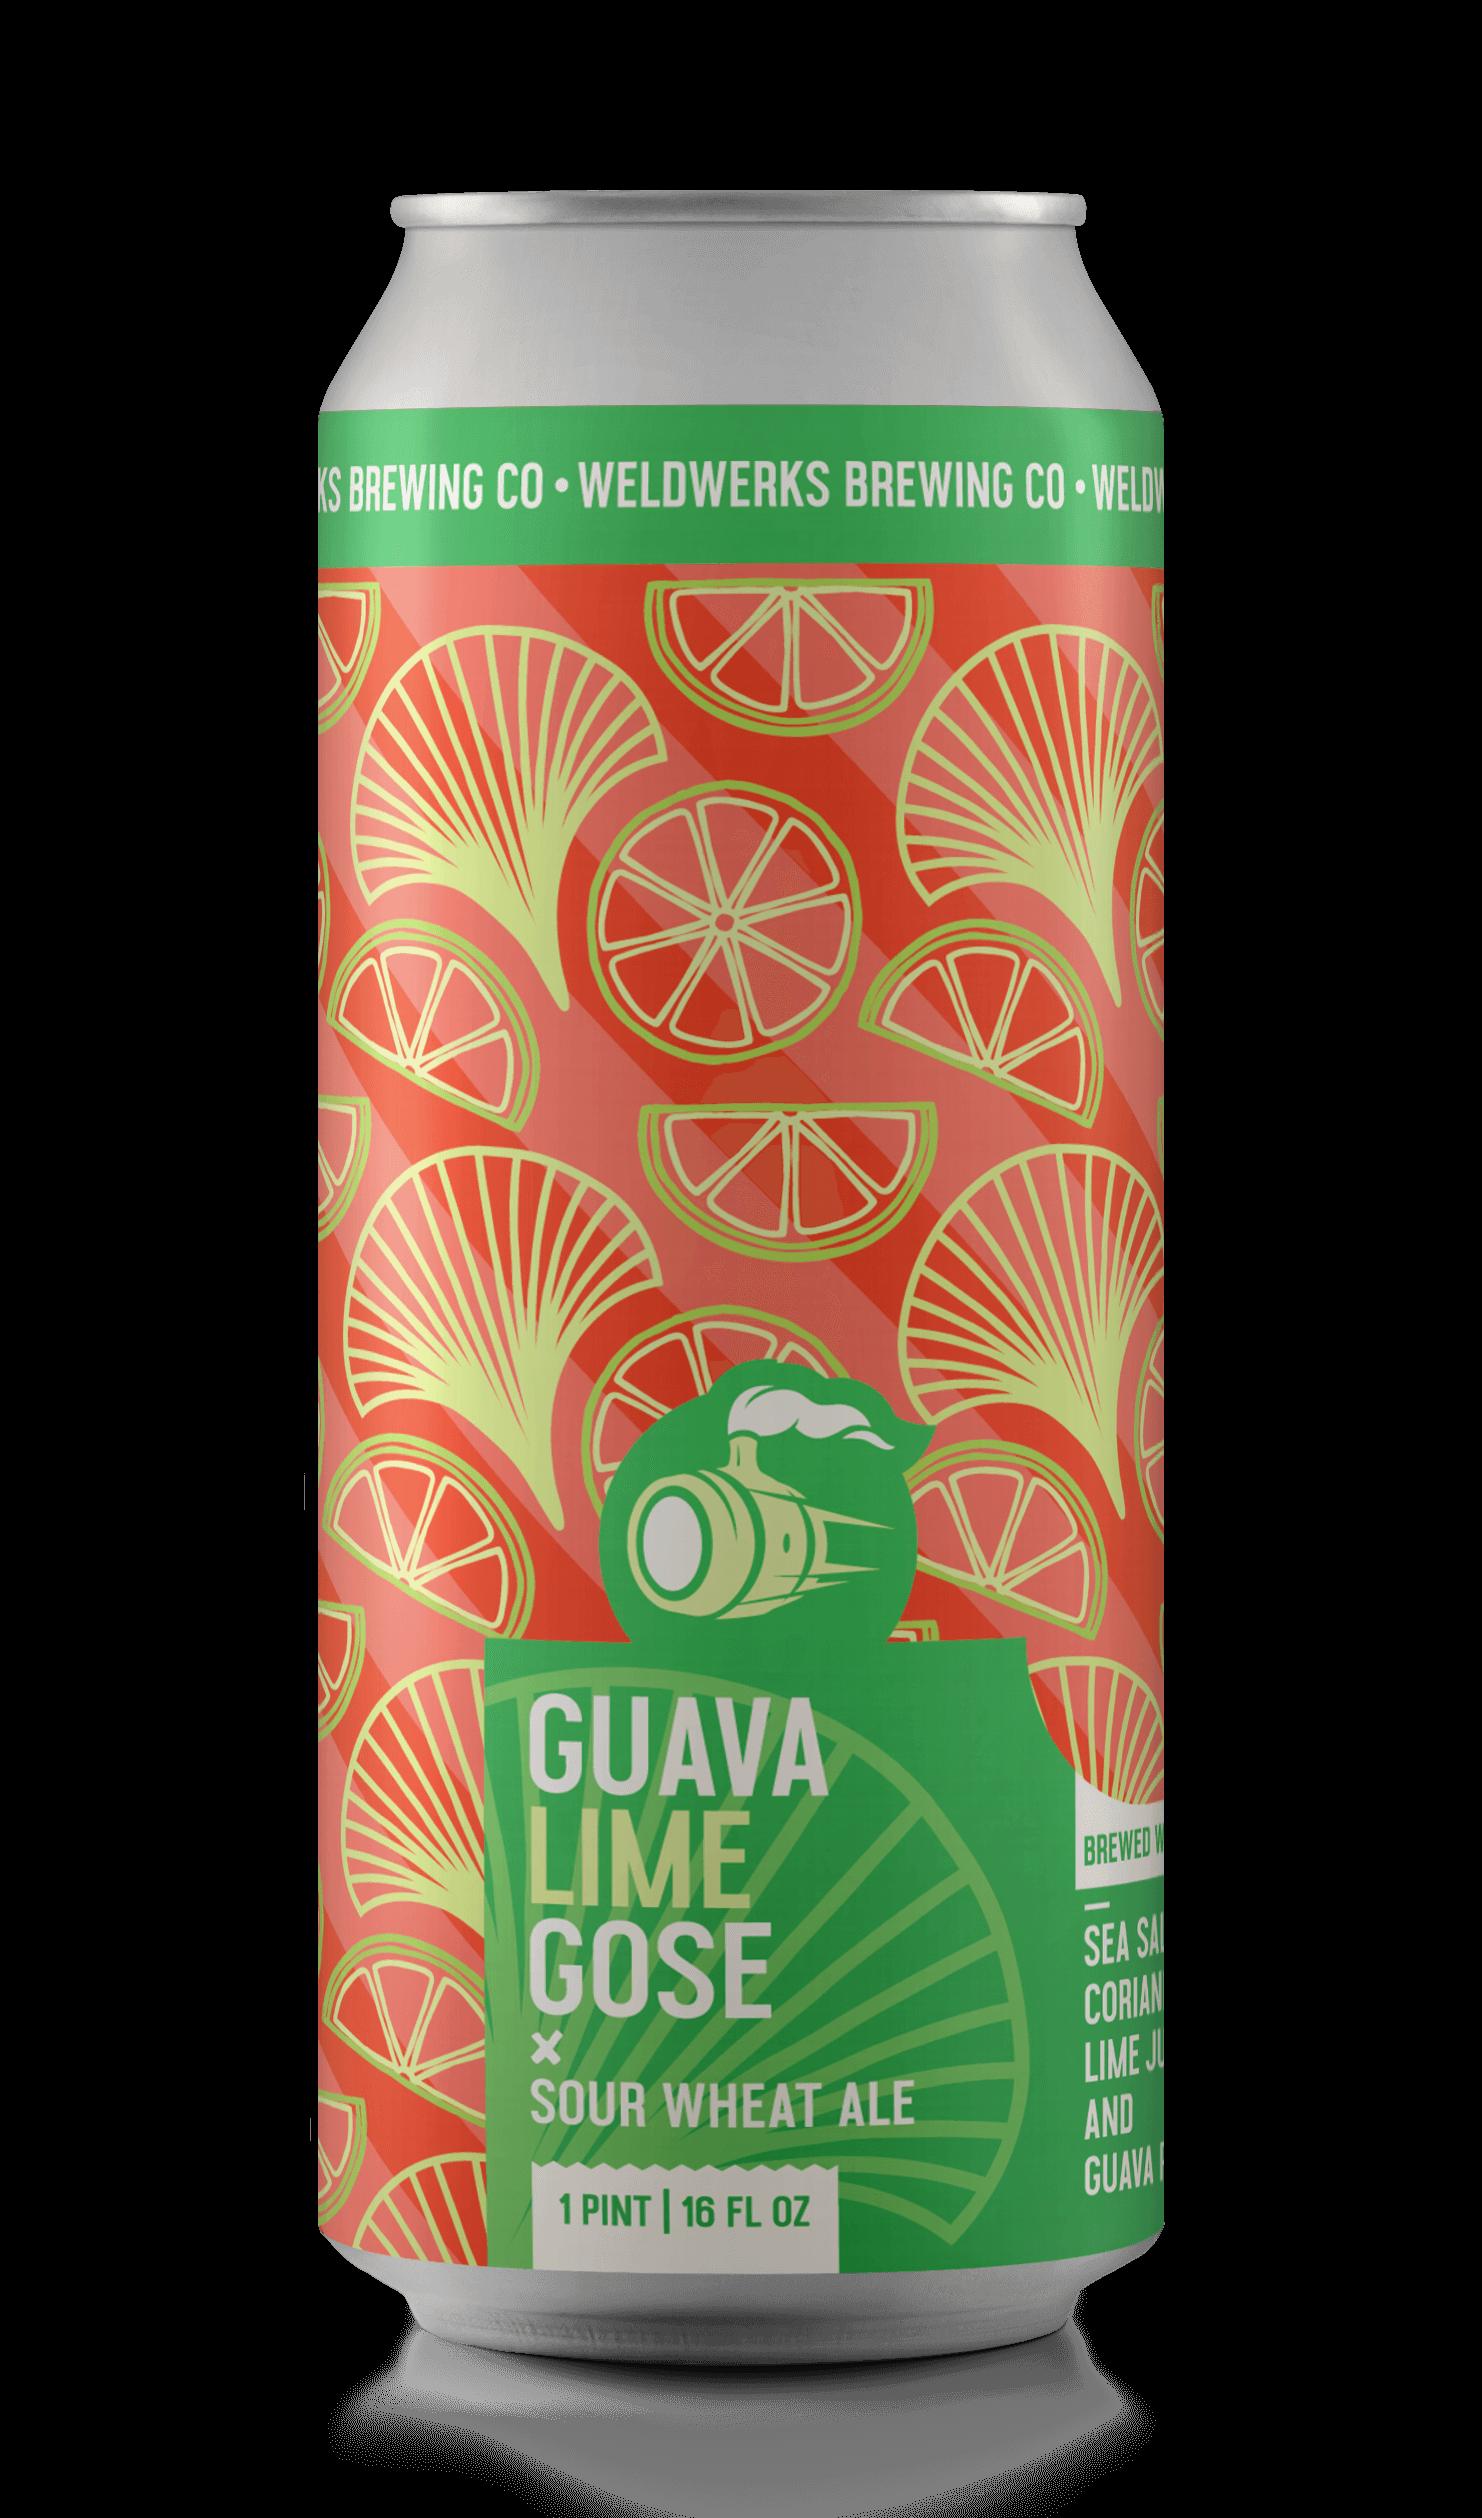 Guava Lime Gose